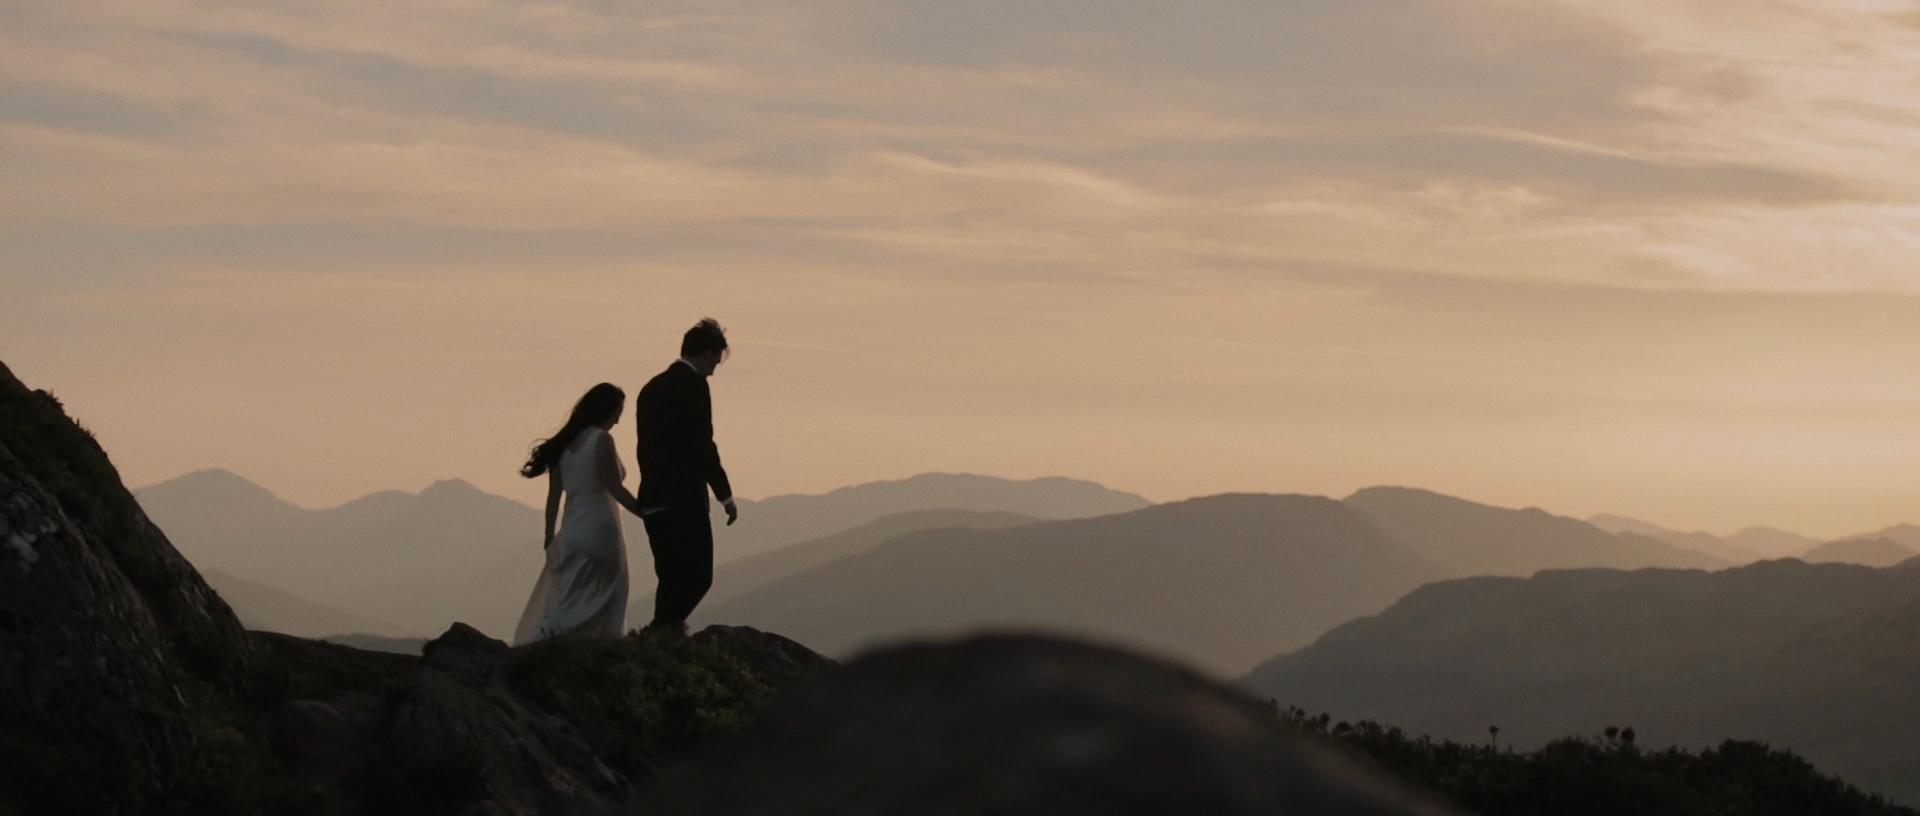 sloans-wedding-videographer_LL_01.jpg